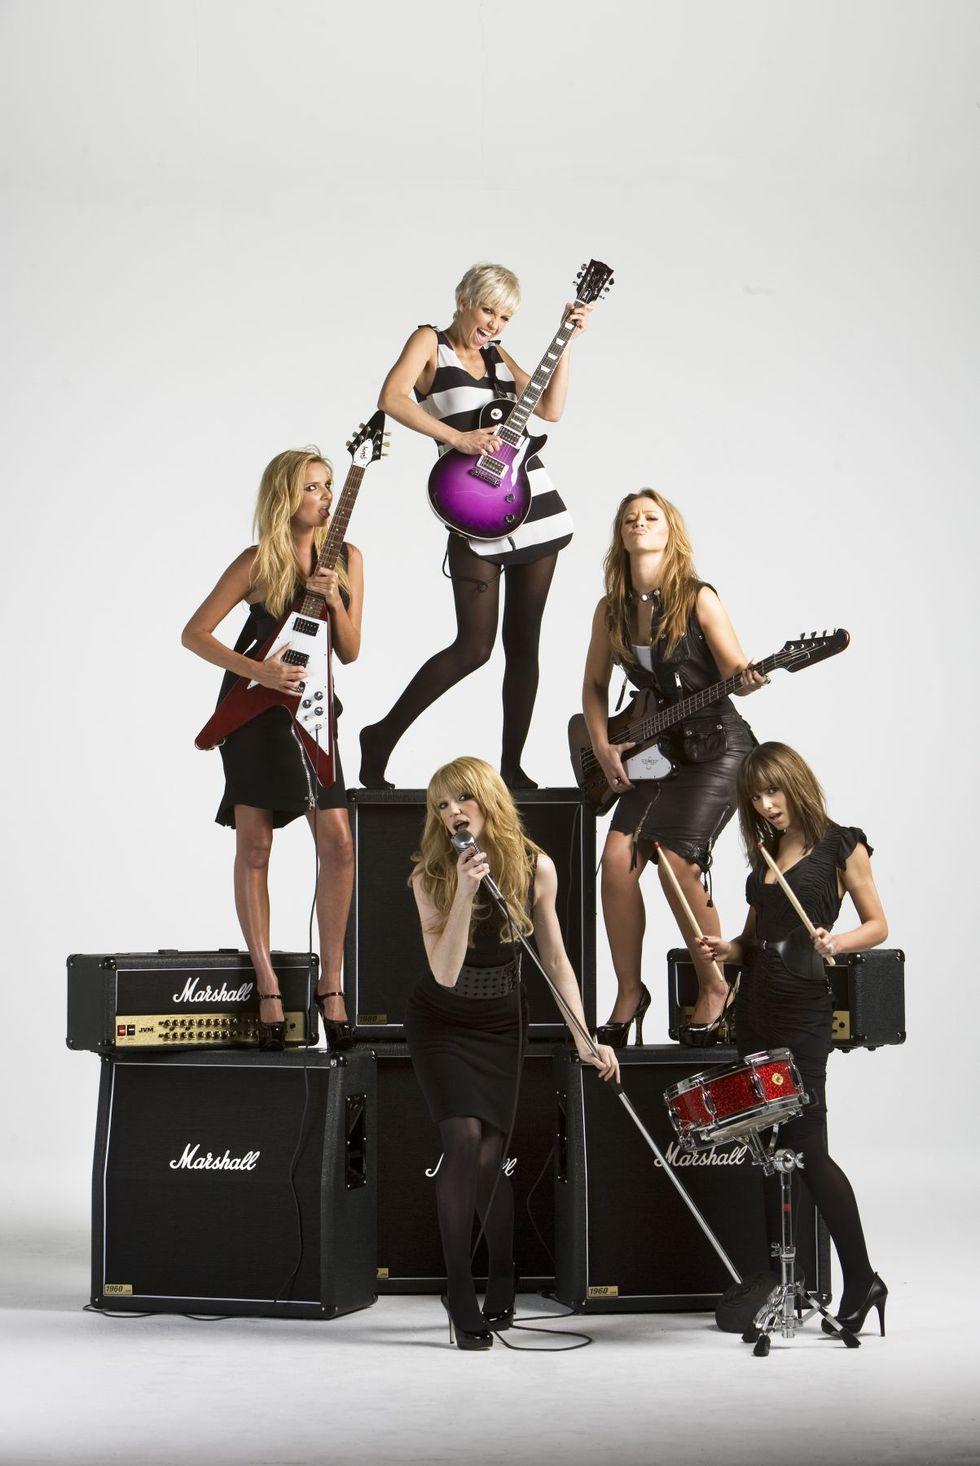 girls-aloud-observer-music-monthly-magazine-photoshoot-01